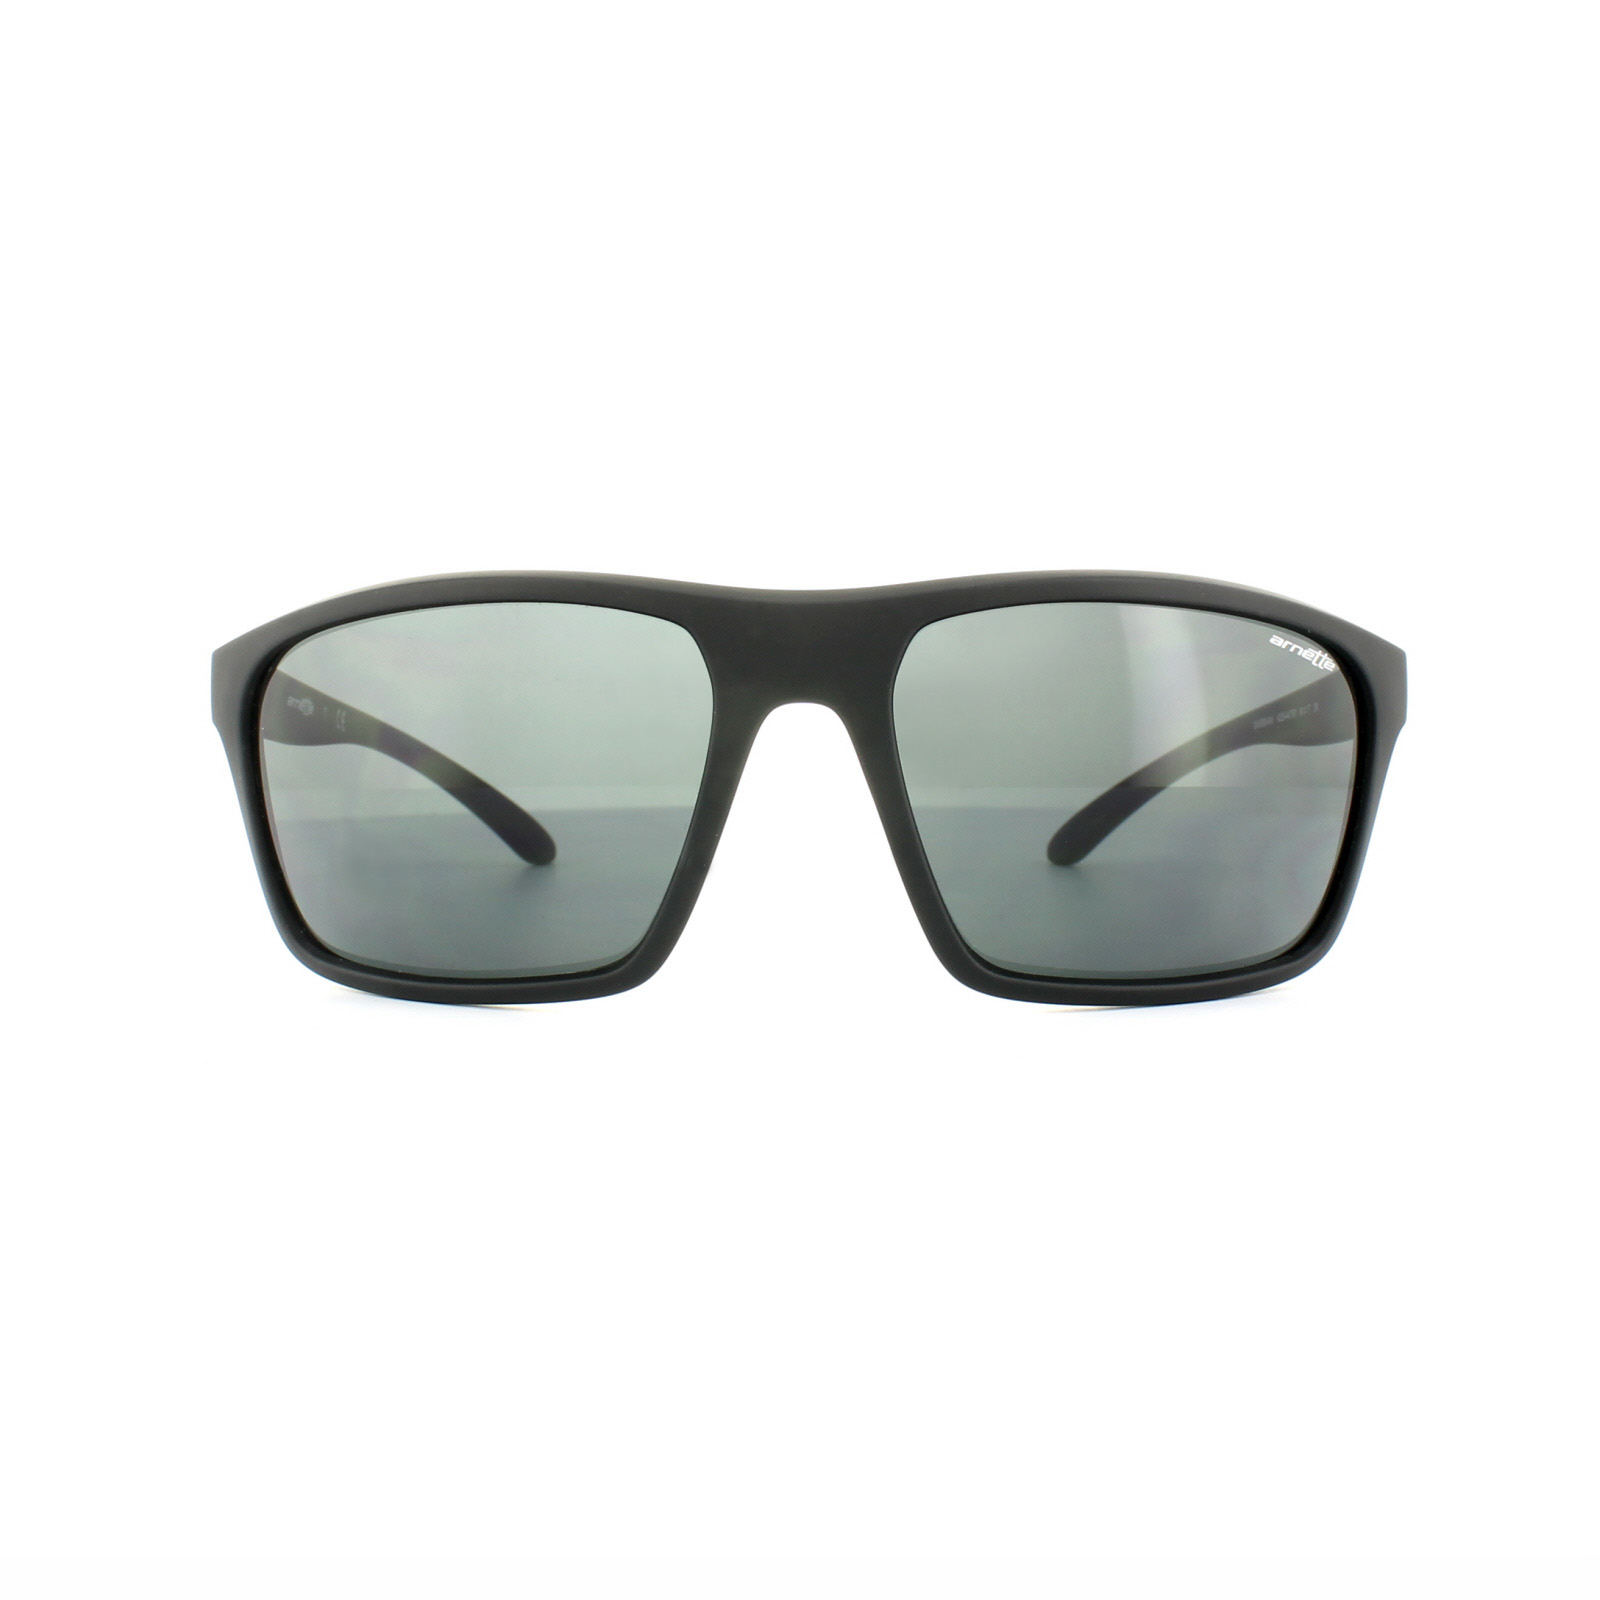 41074fd56f Discount Arnette Sunglasses